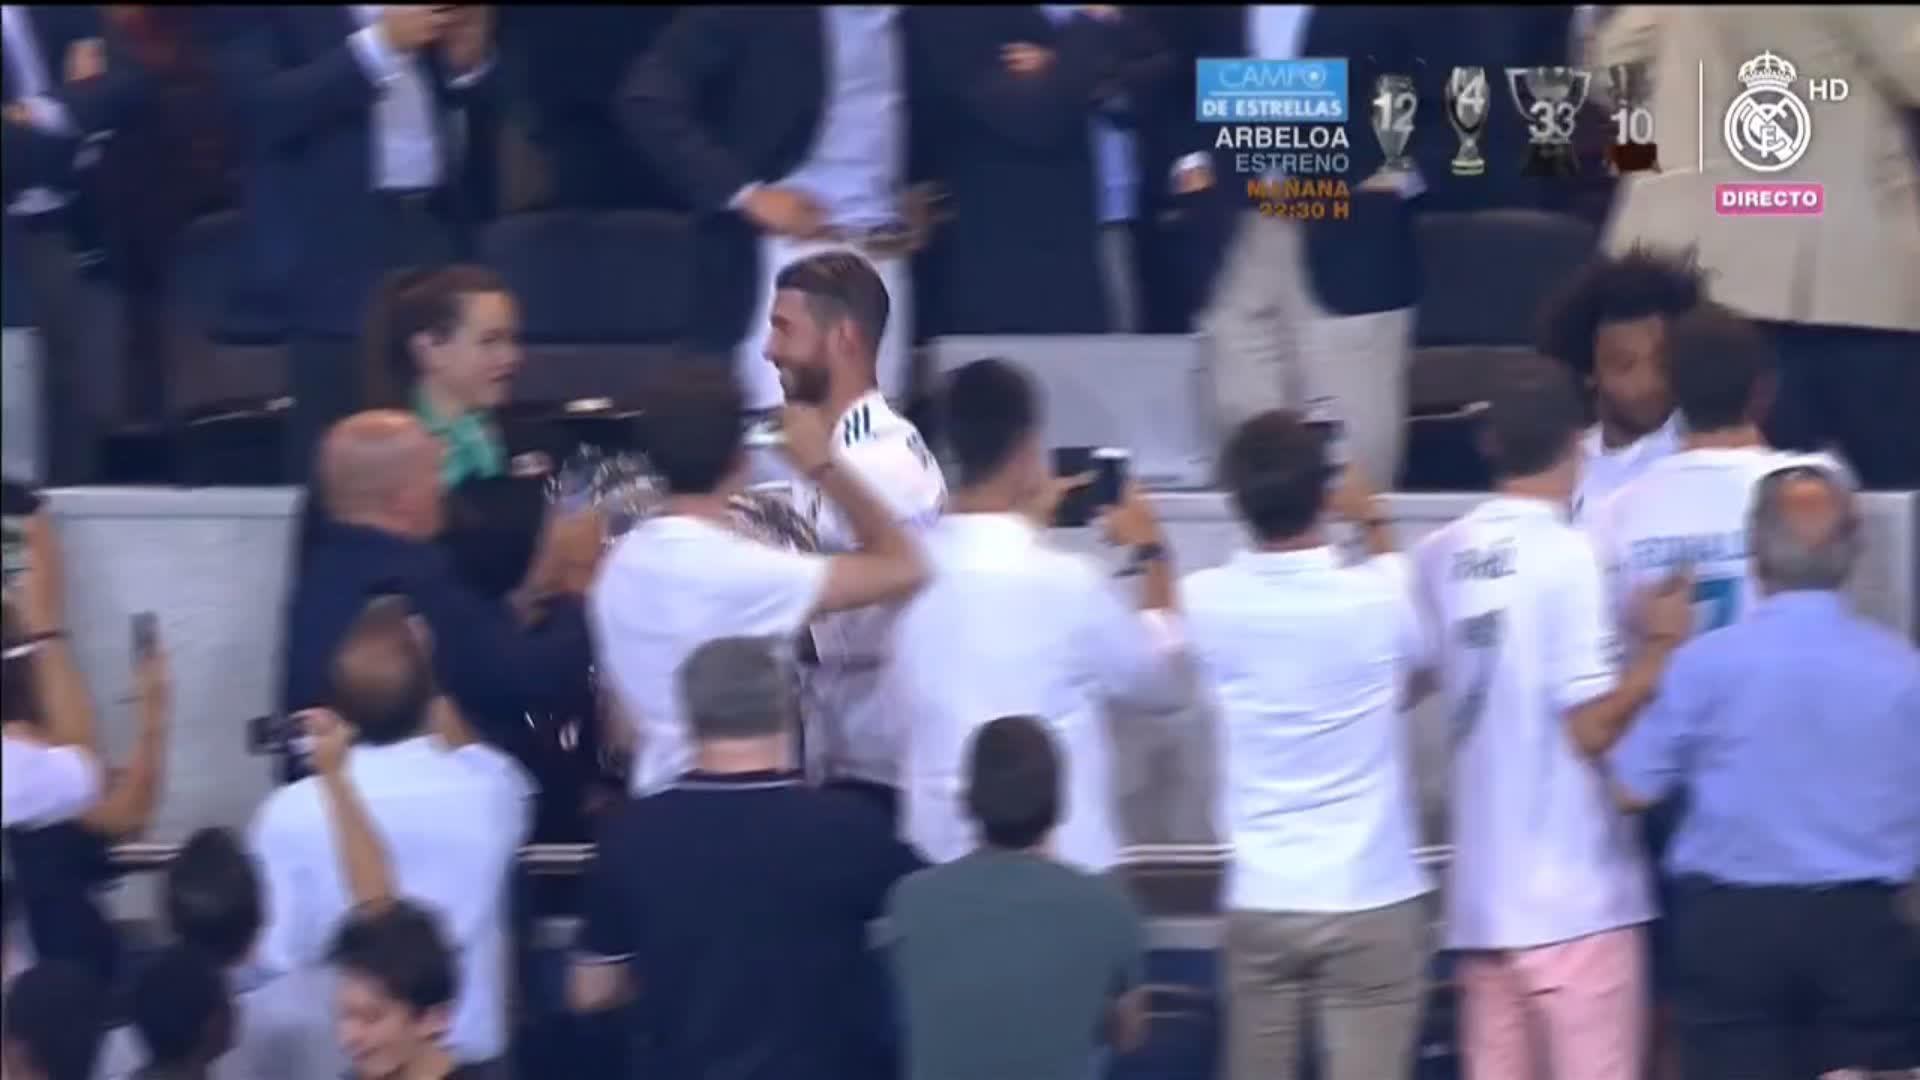 ������ Trofeo Santiago Bernabéu by Movistar  ¡CAMPEONES!  #RealMadrid 2-1 @acffiorentina https://t.co/nxC6bHjEQf